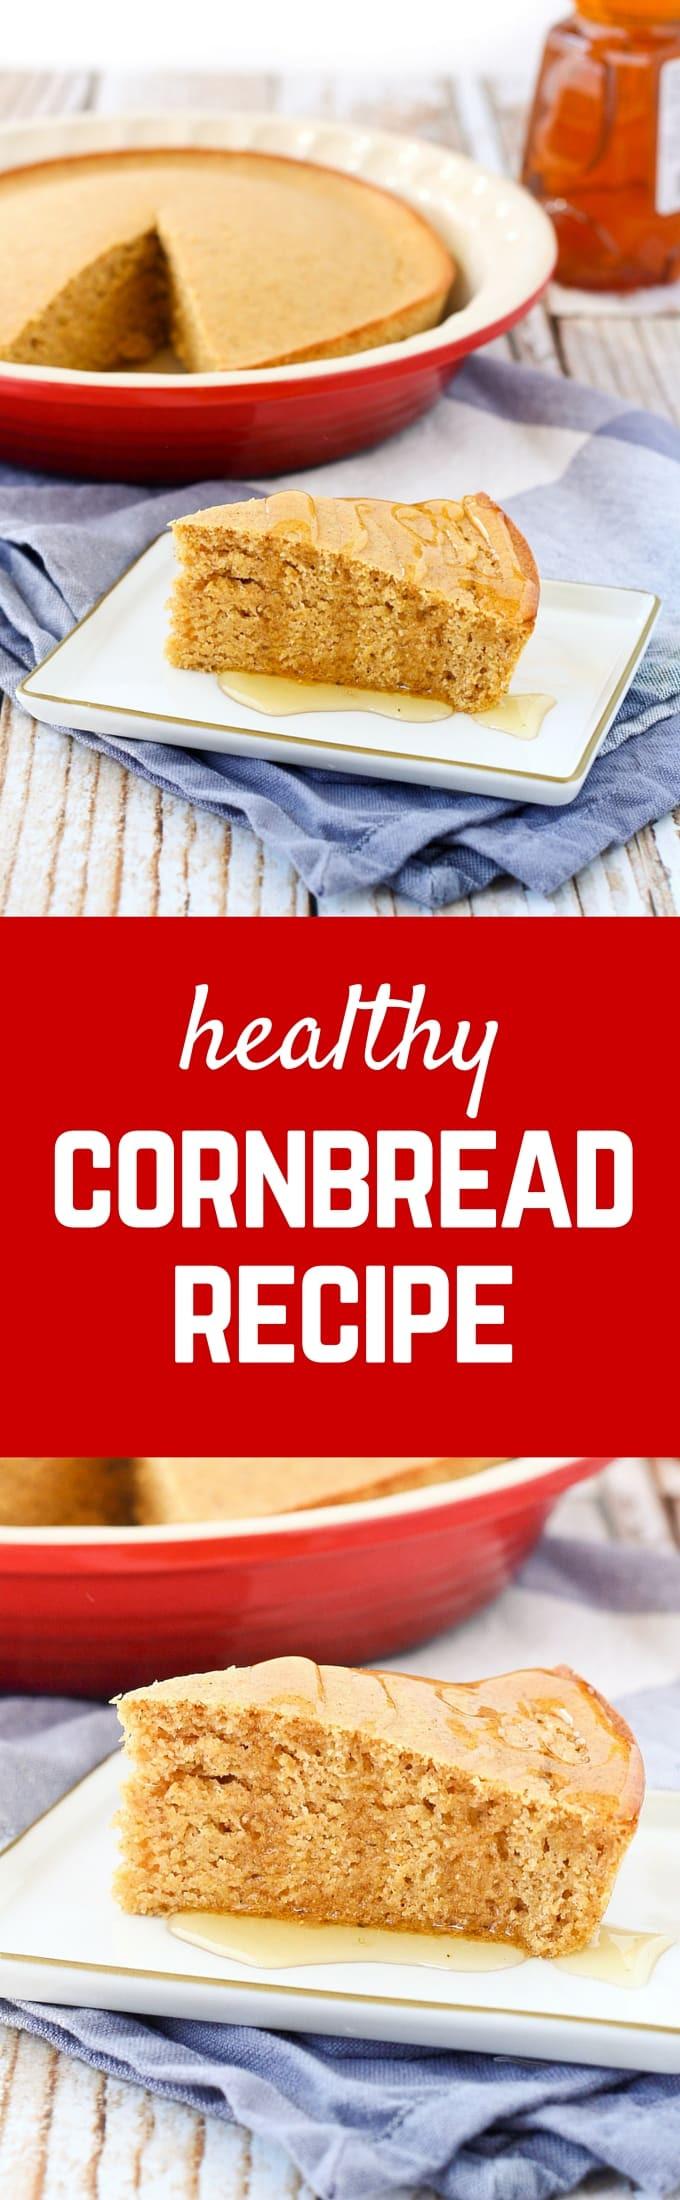 Healthy Cornbread Recipe  Healthy Cornbread Recipe whole wheat Rachel Cooks